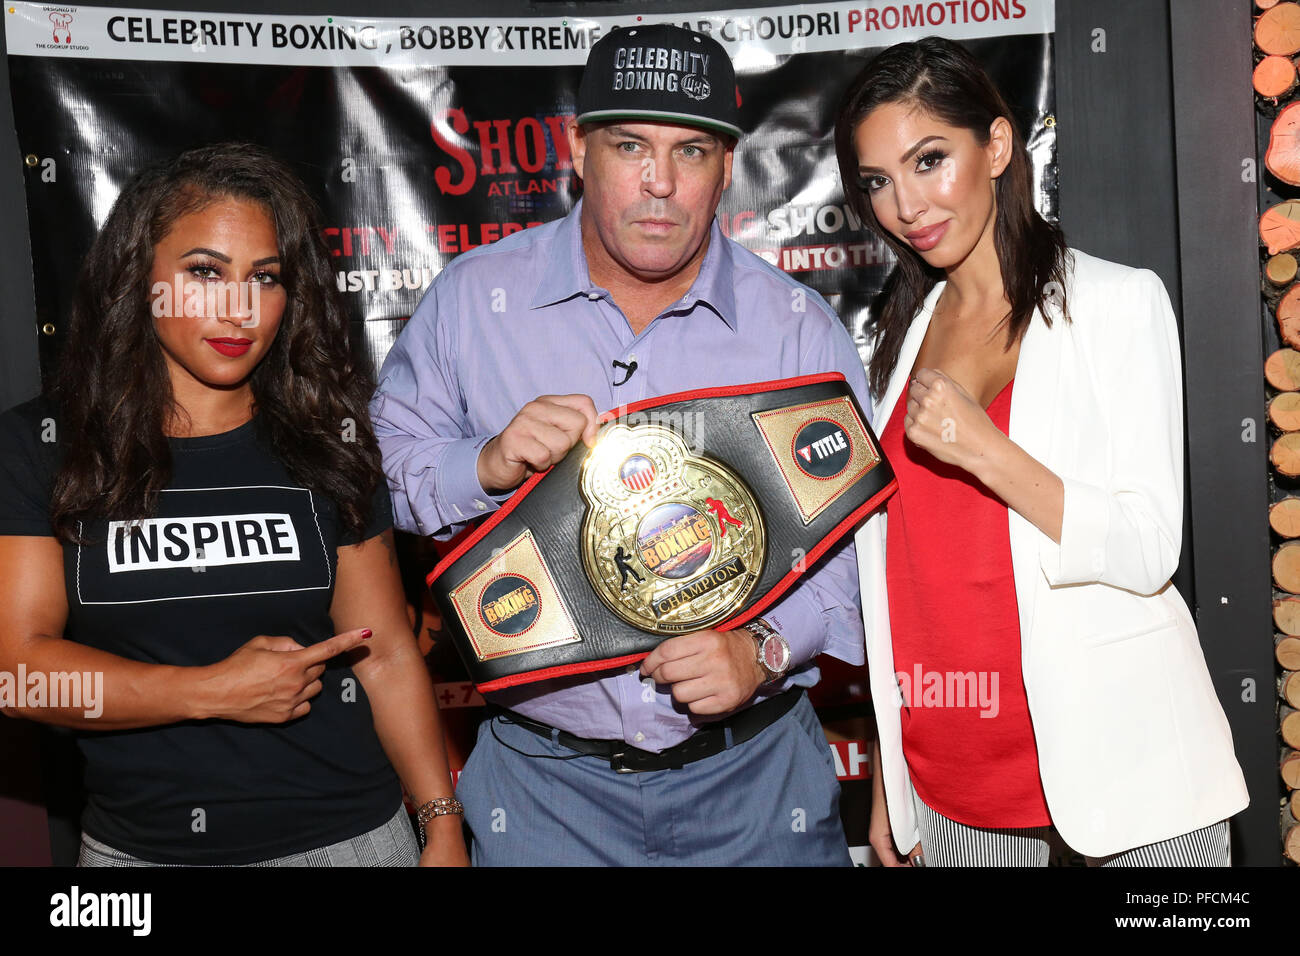 Celebrity boxing match 2019